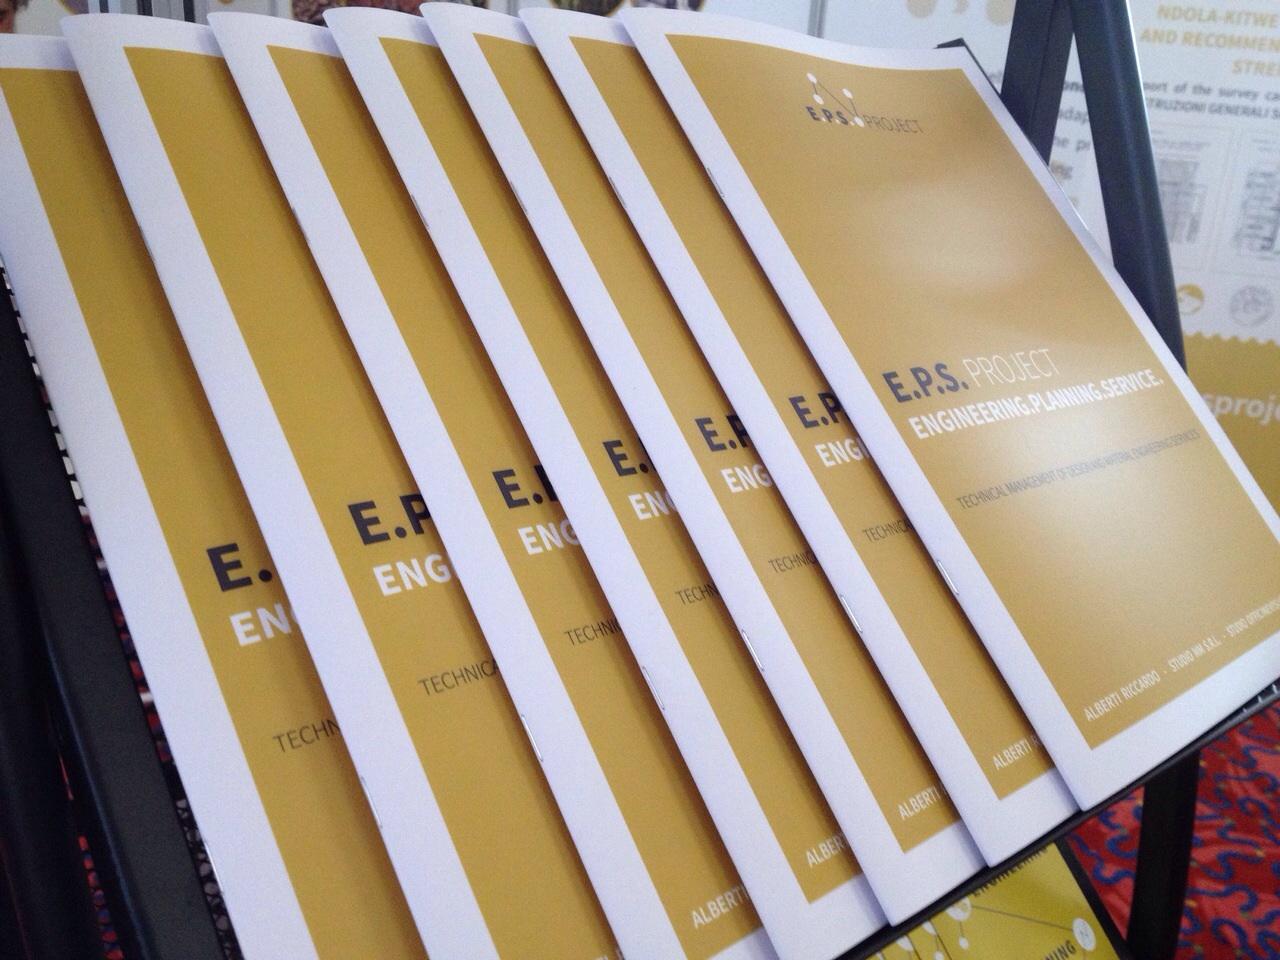 E.P.S. brochure